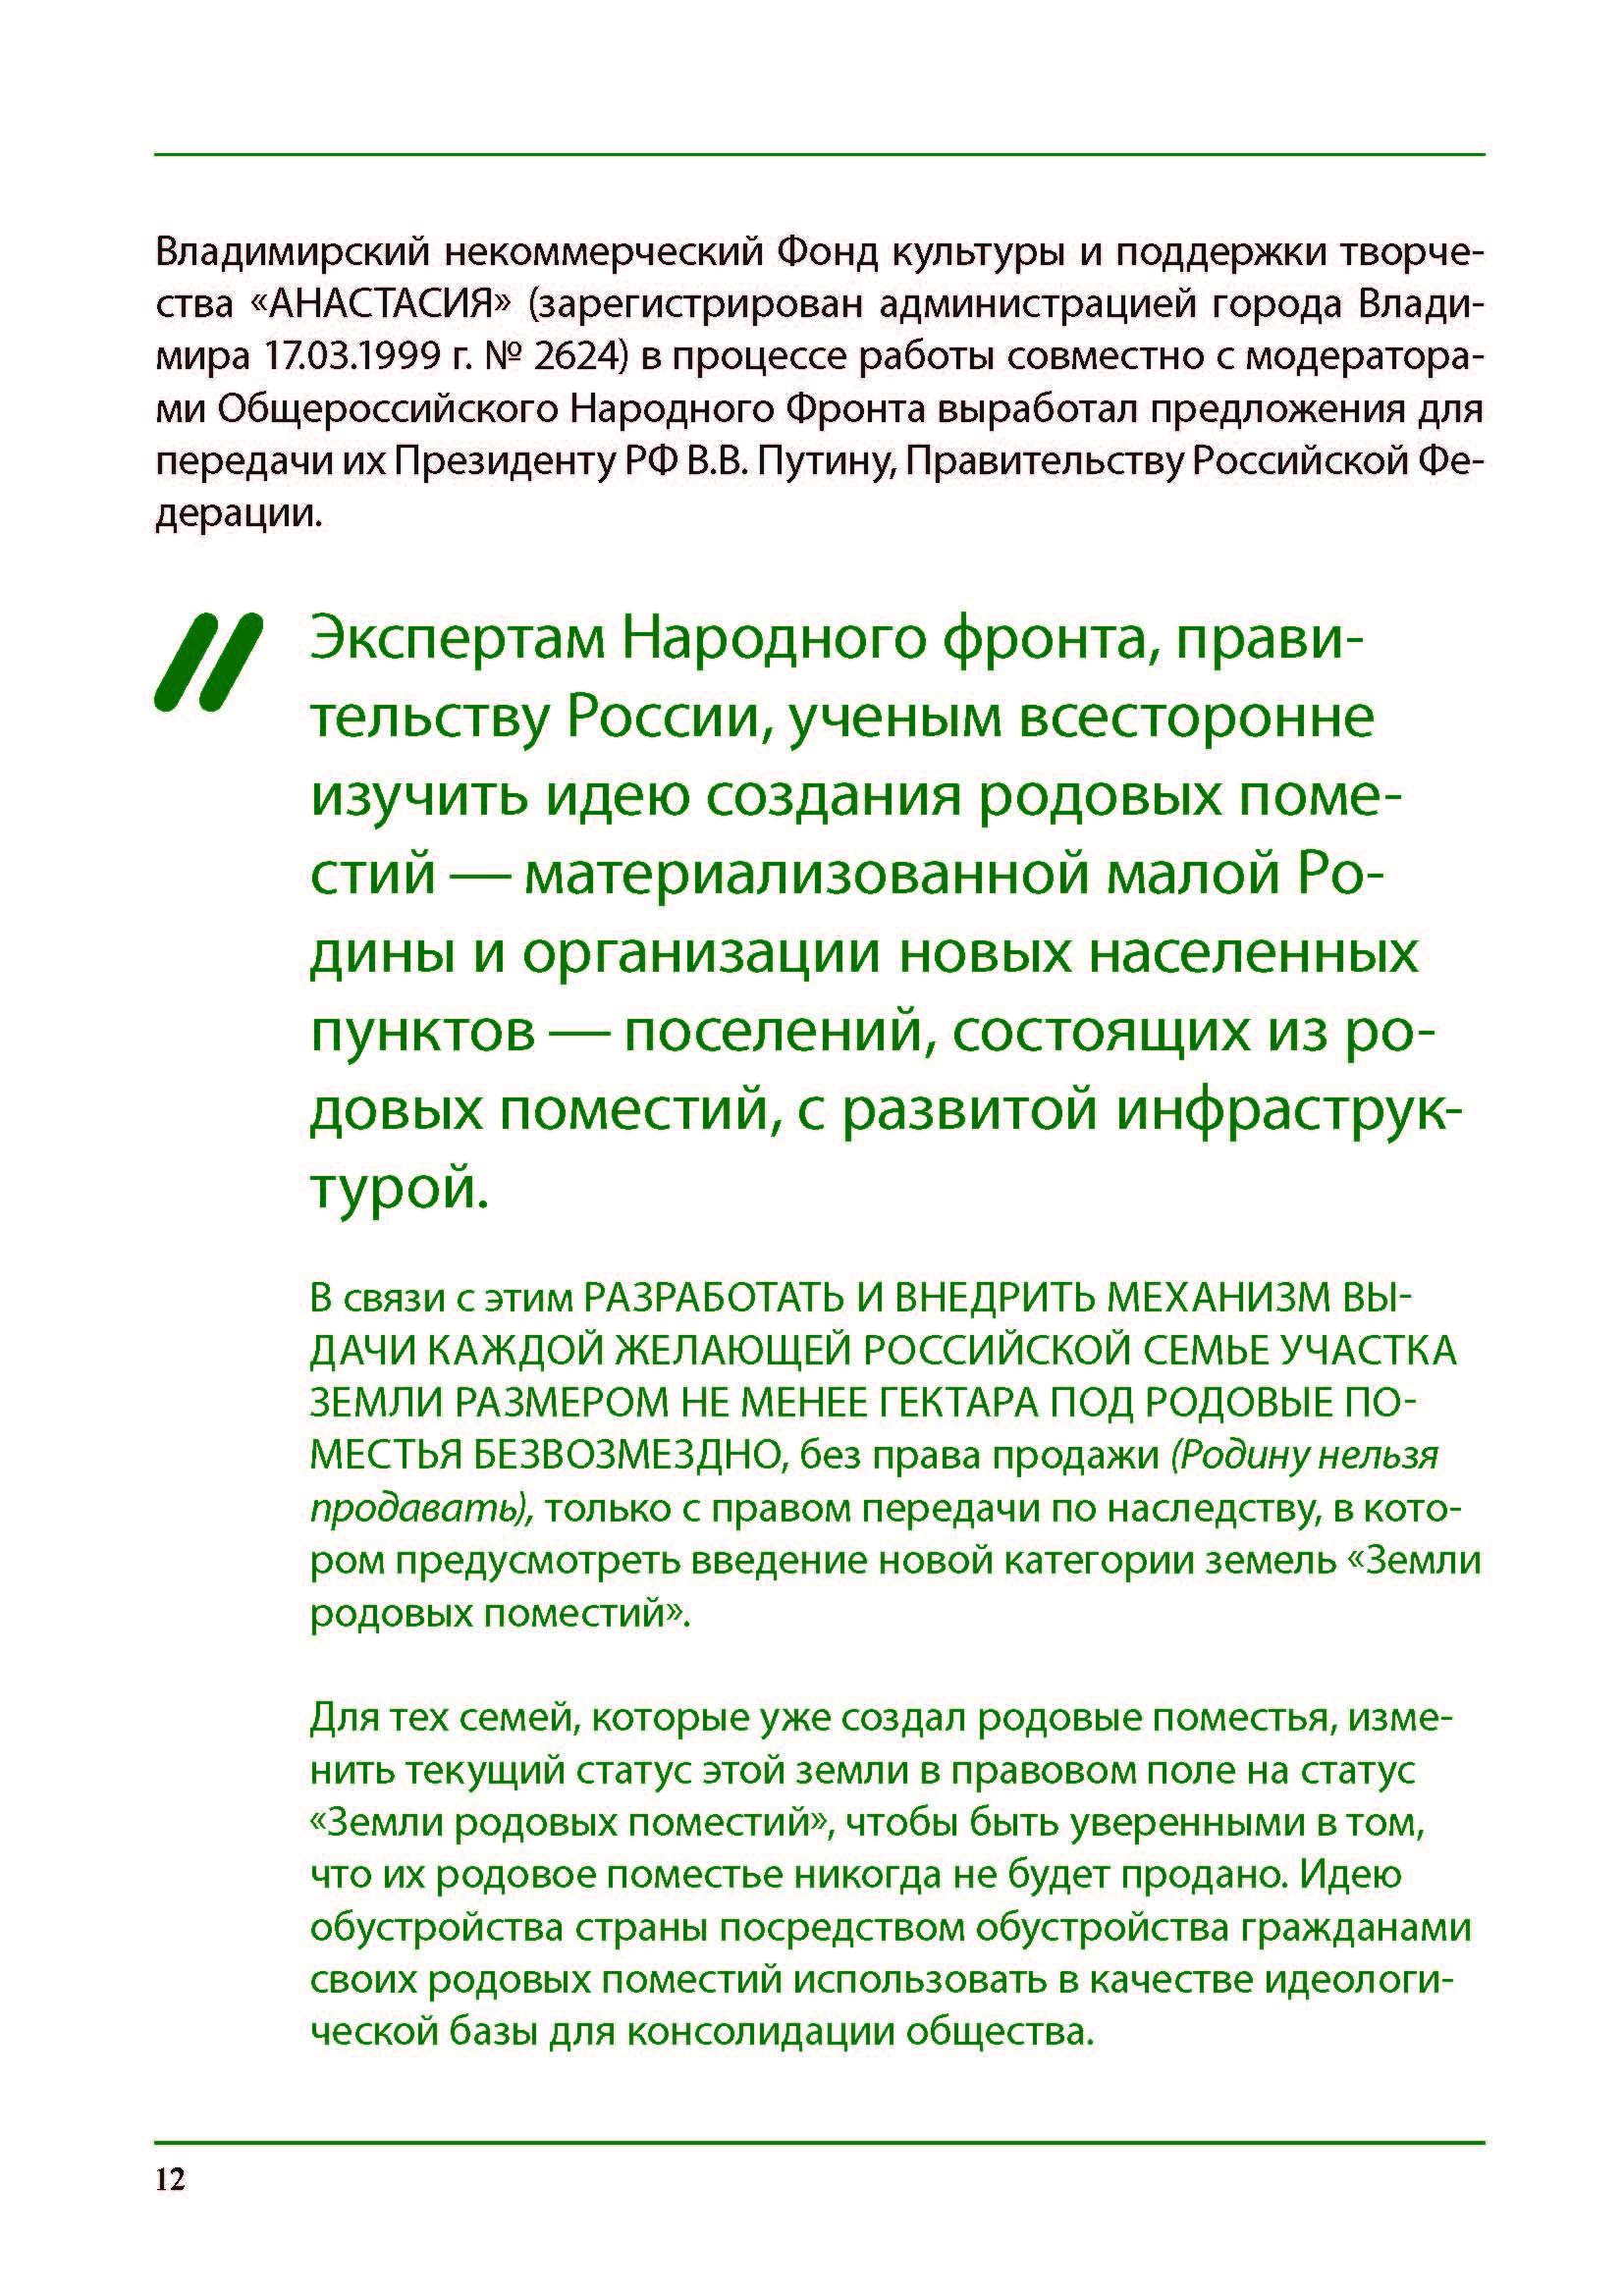 Фонд Поправка Конституция (12).jpg